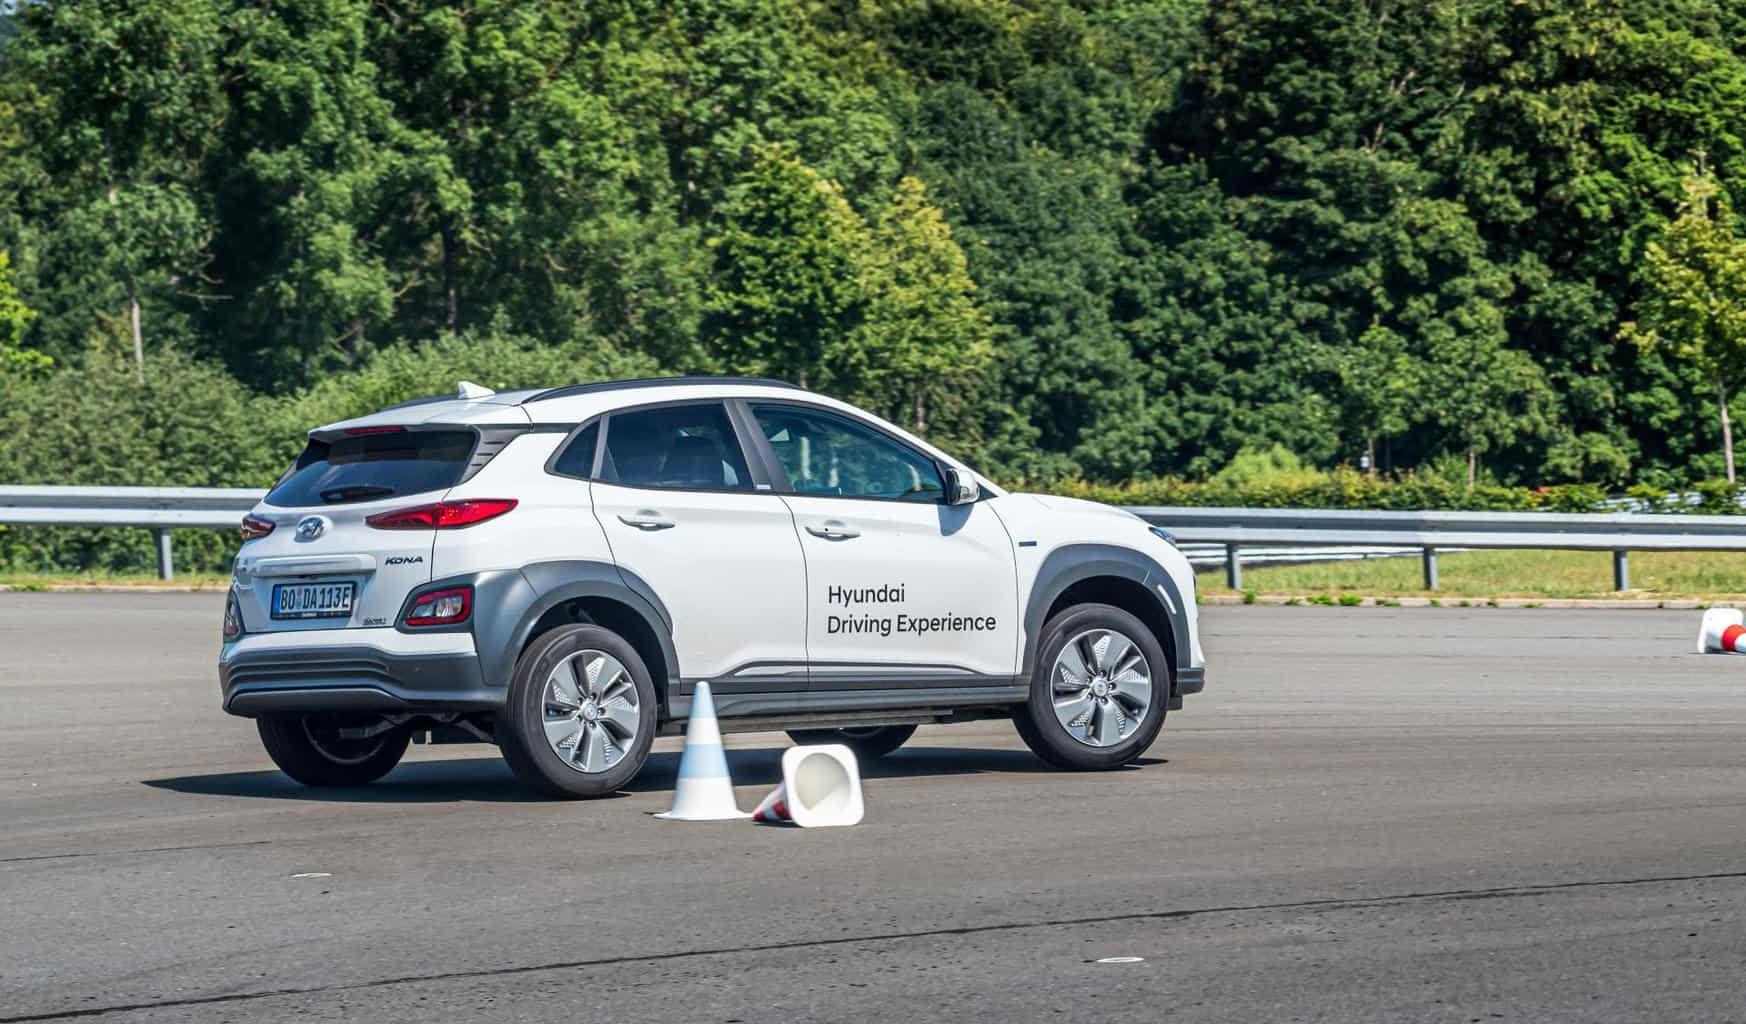 """Hyundai Driving Experience"": Grenz-Erfahrung mit der E-Mobilität"